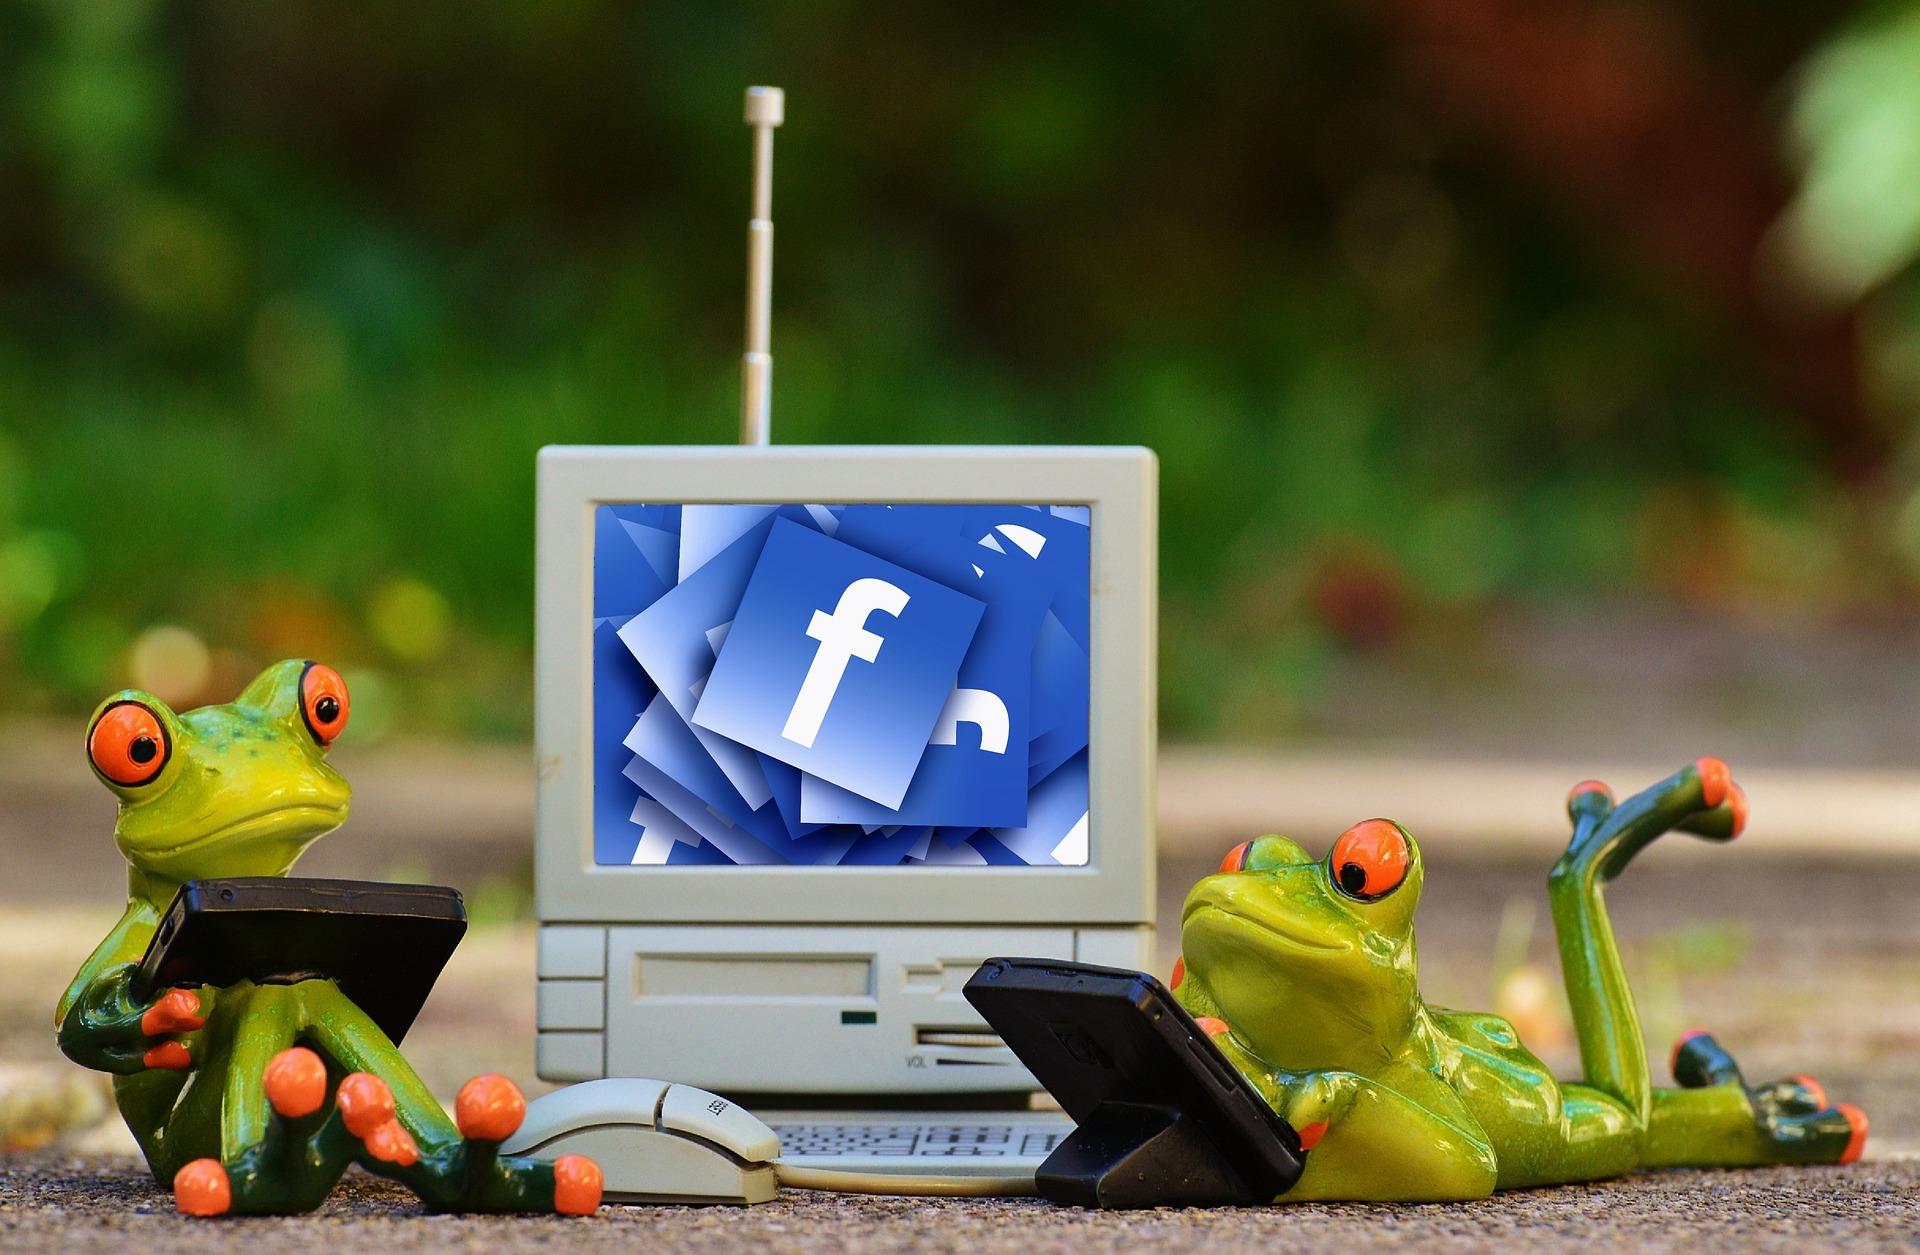 Лягушки тоже подключились к сети Интернет